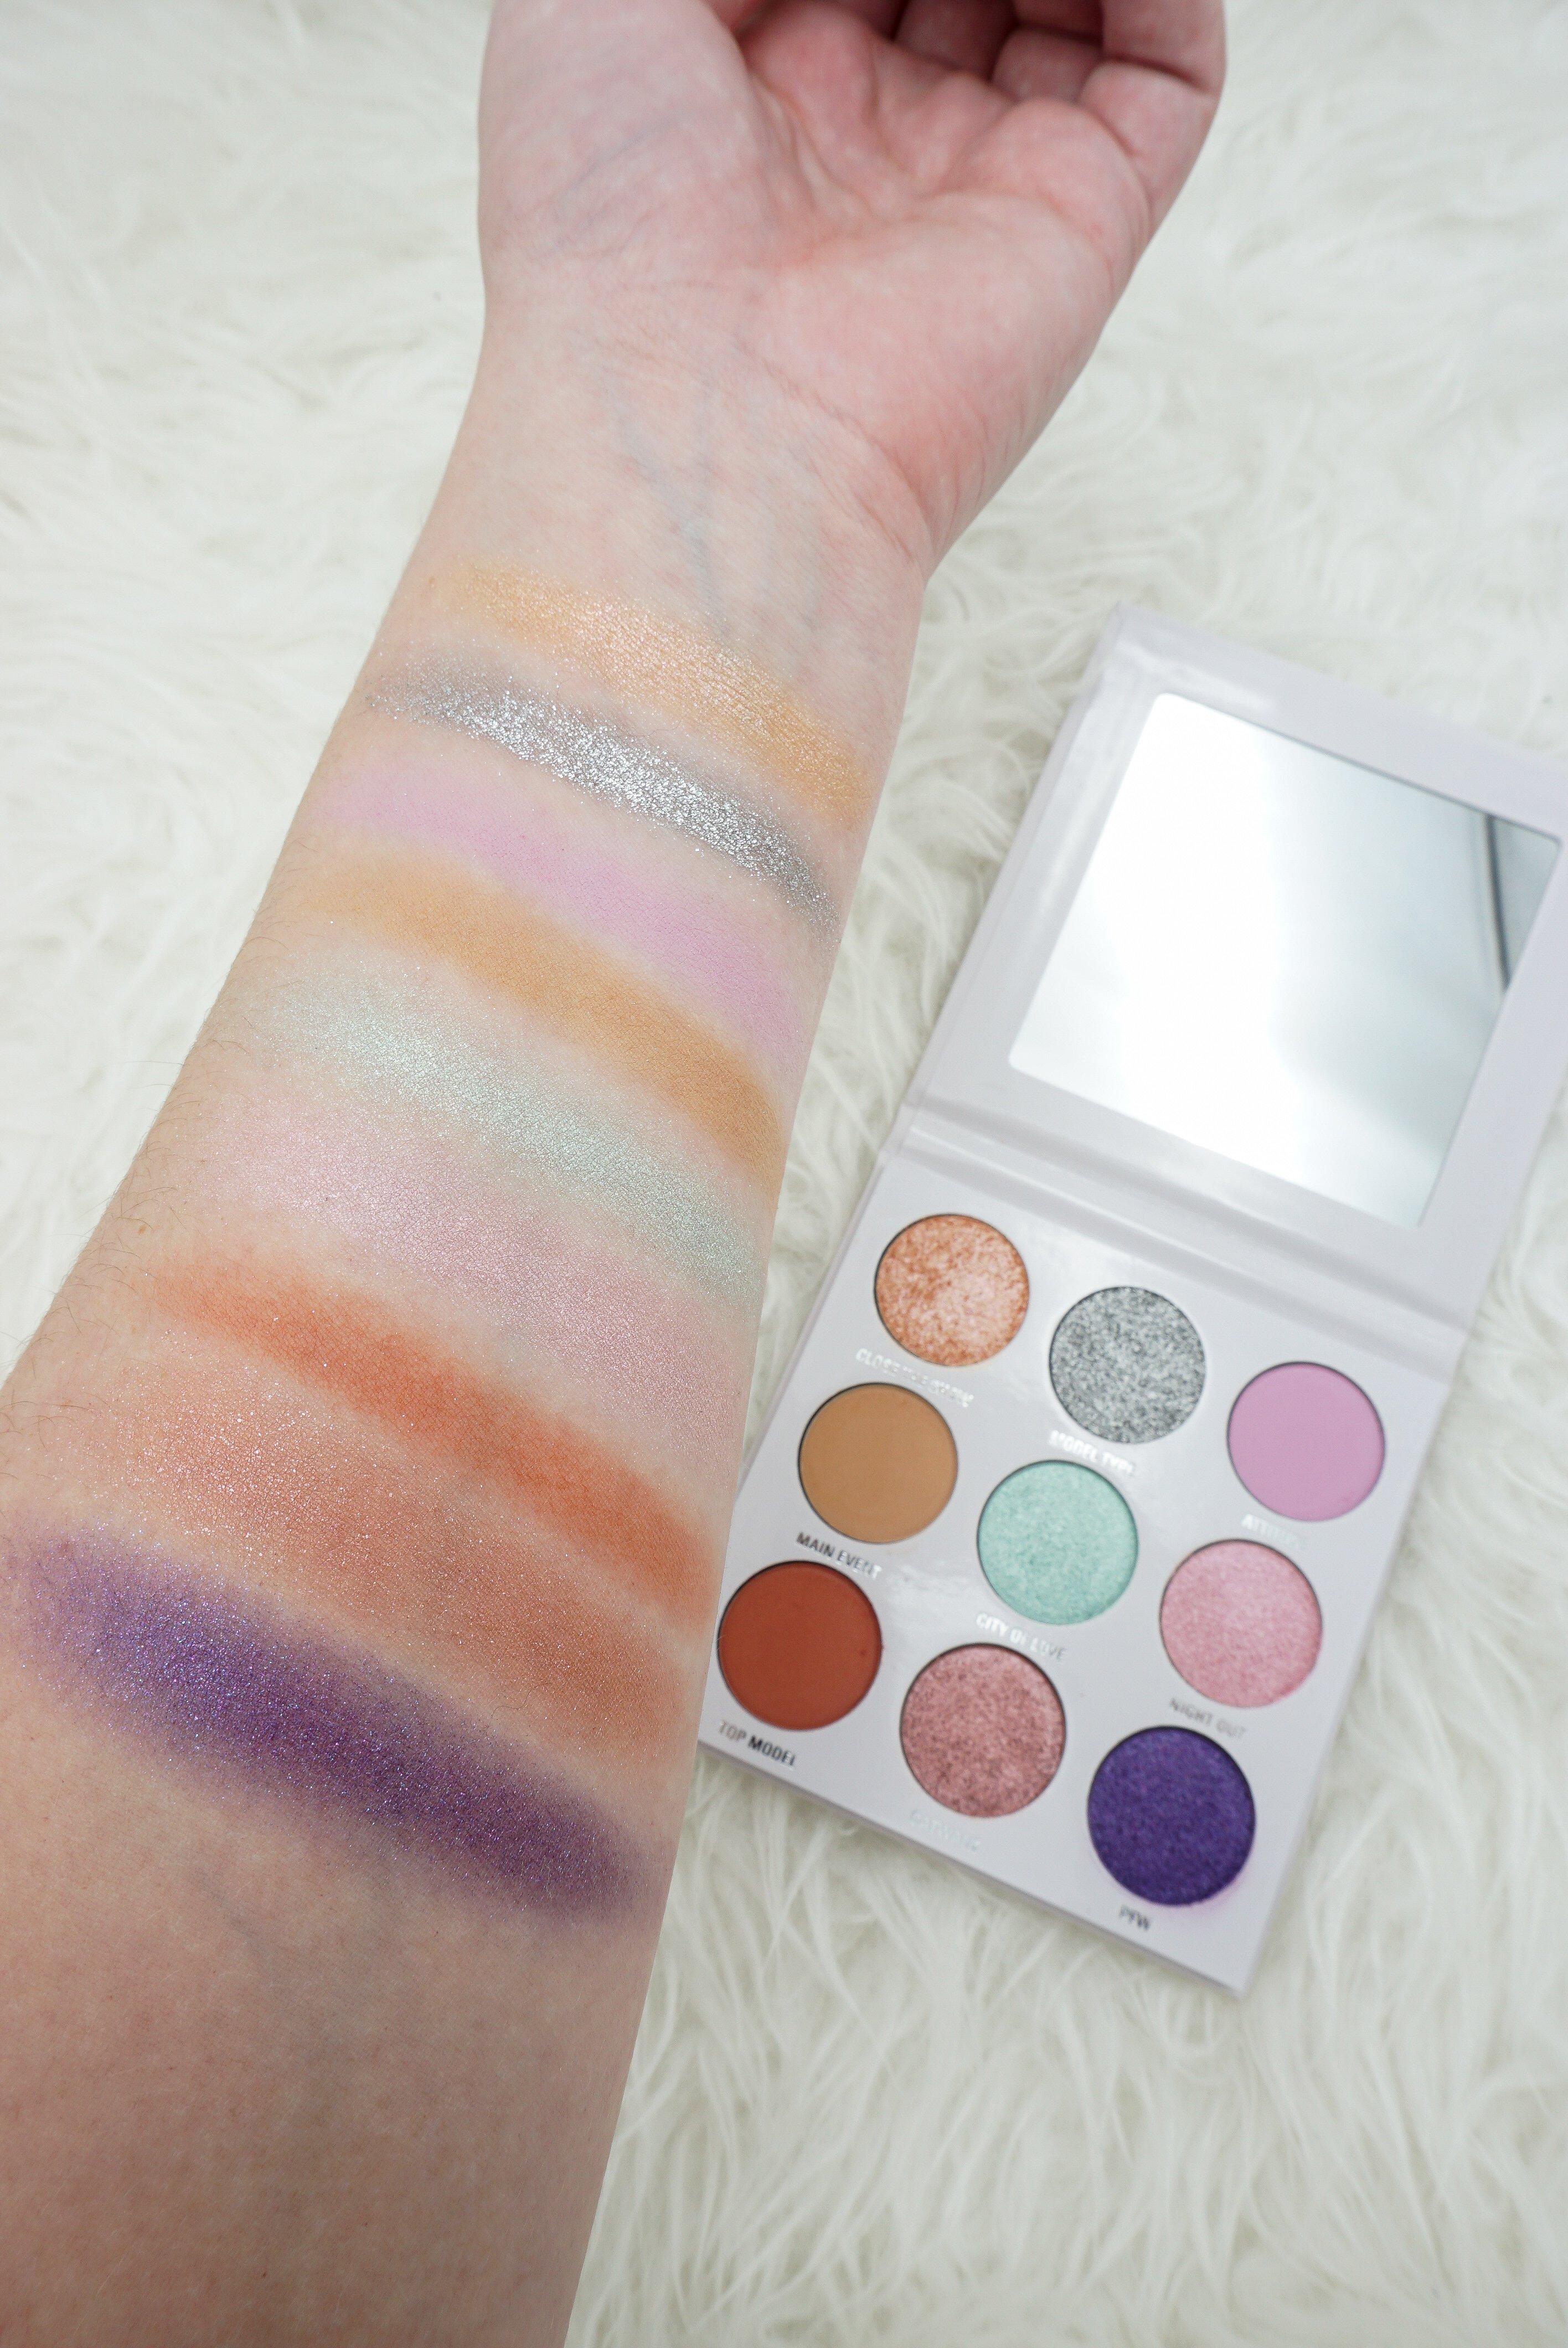 Kylie x Balmain Palette by Kylie Cosmetics #7